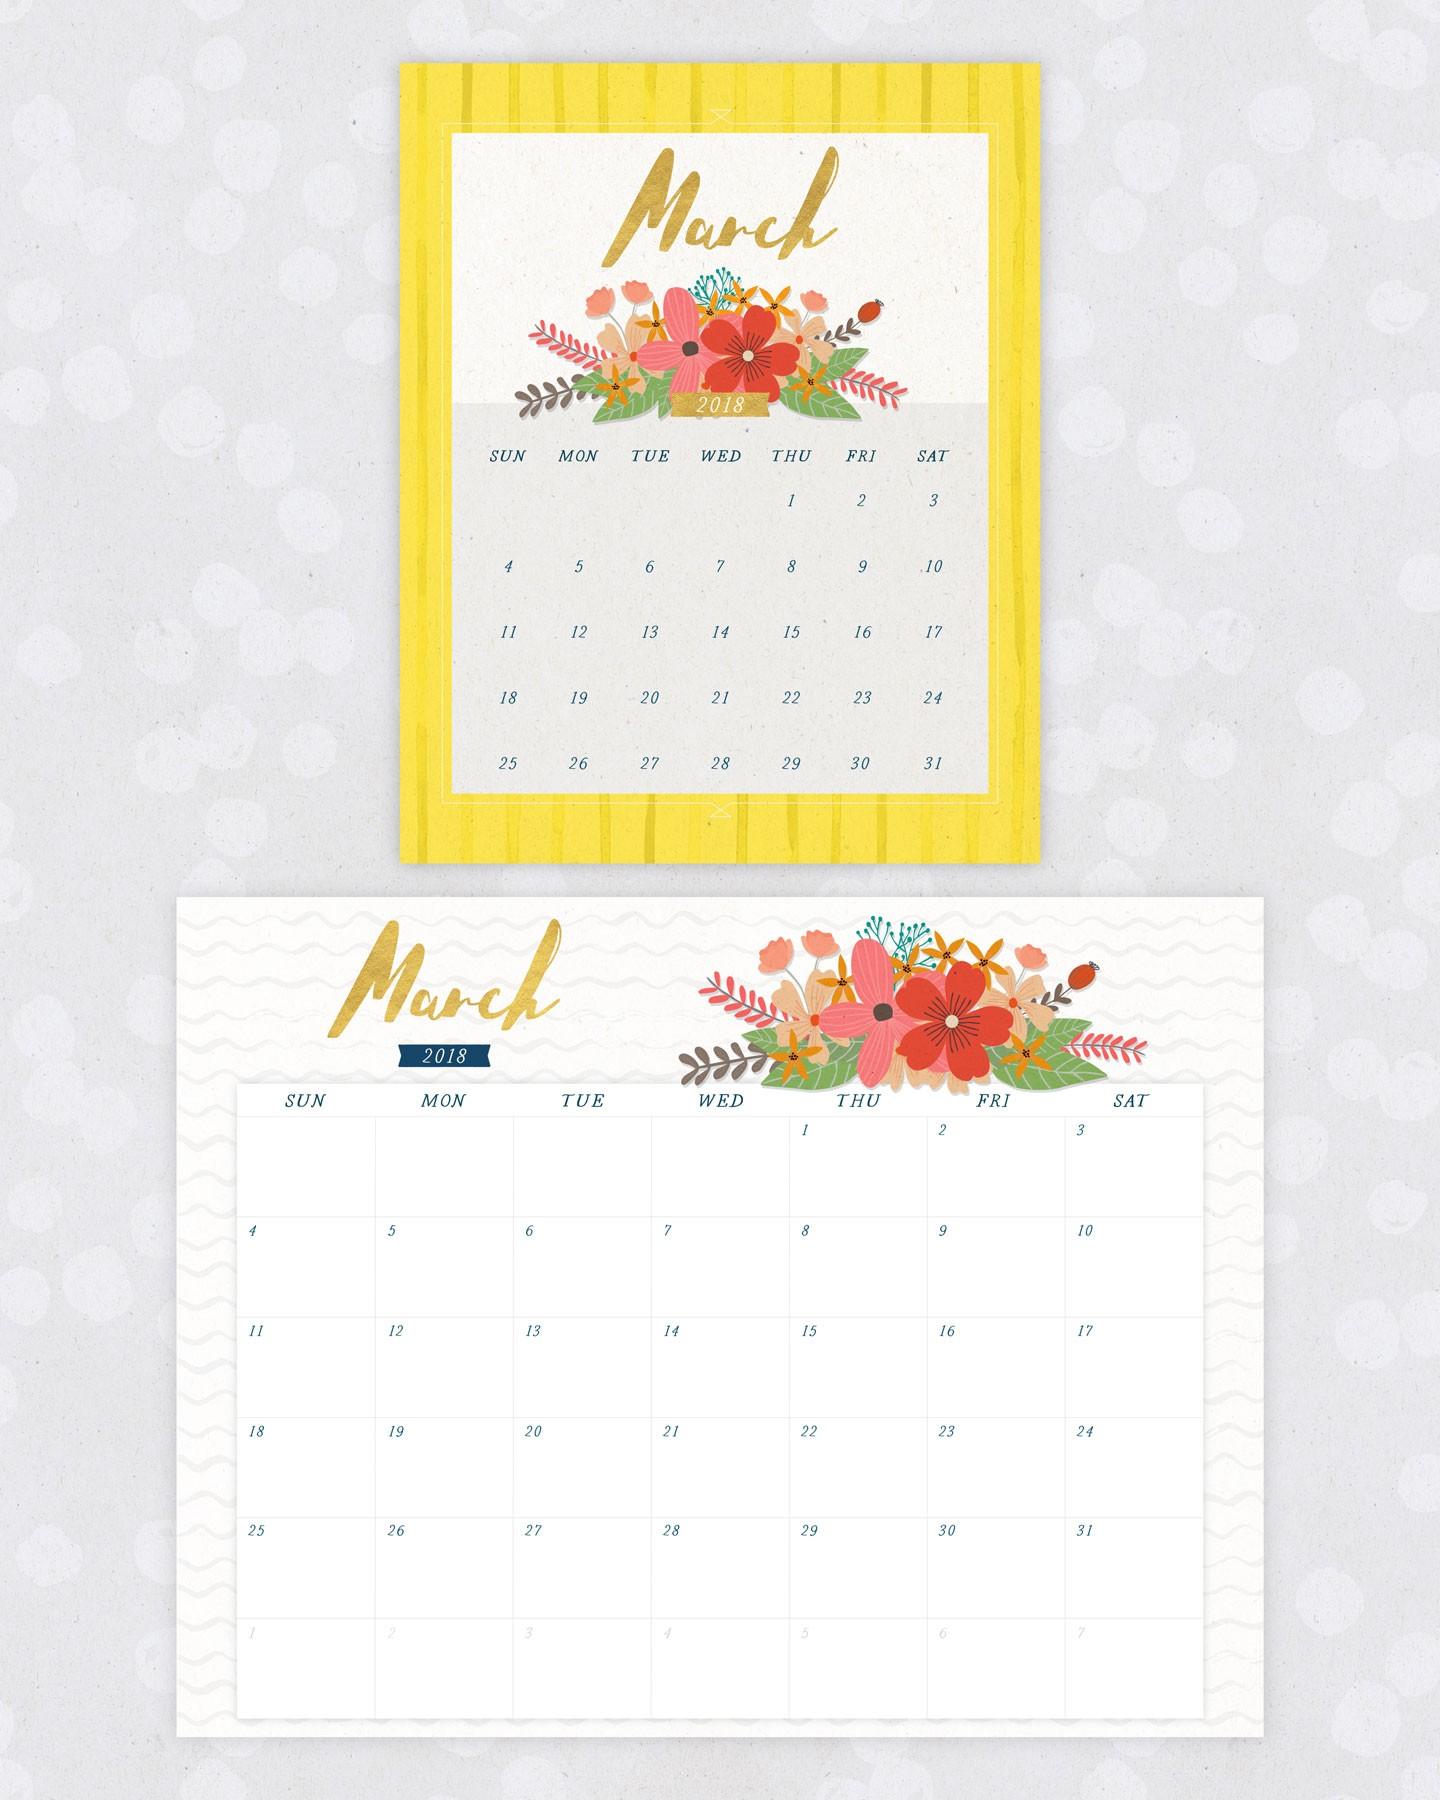 2018 March Floral Calendar